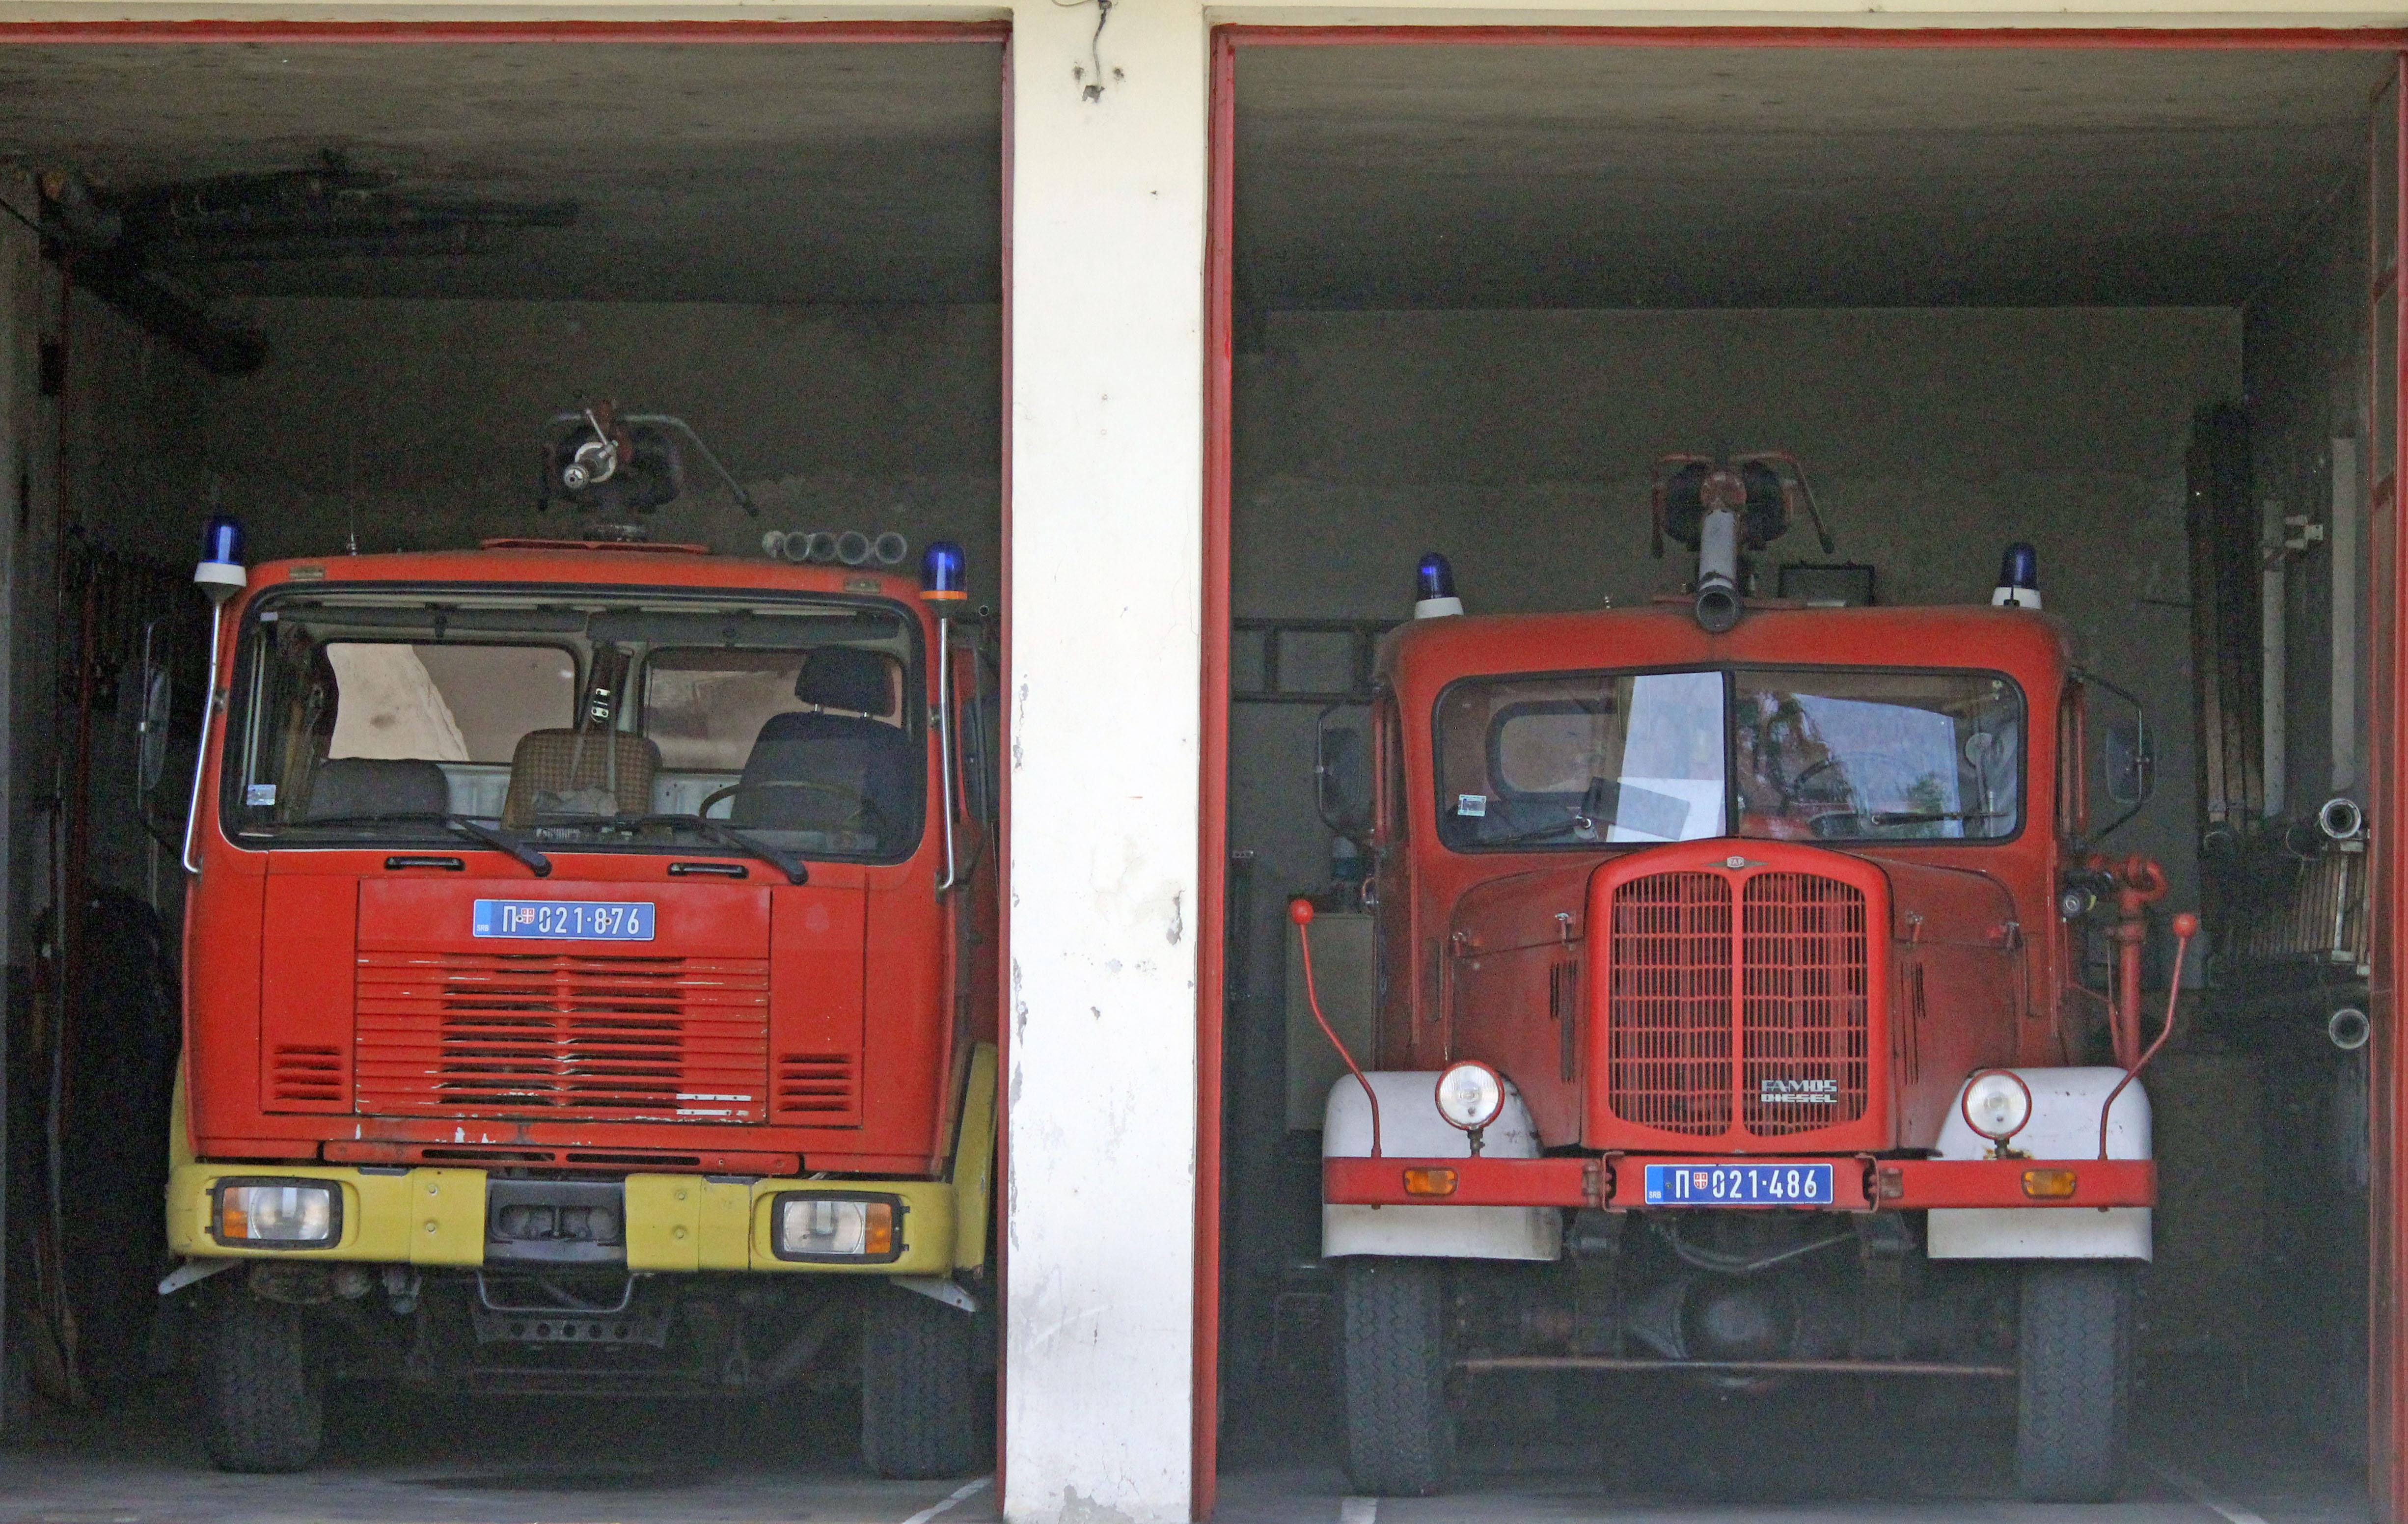 File:FAP 1620 i FAP 1314 vatrogasci jpg - Wikimedia Commons